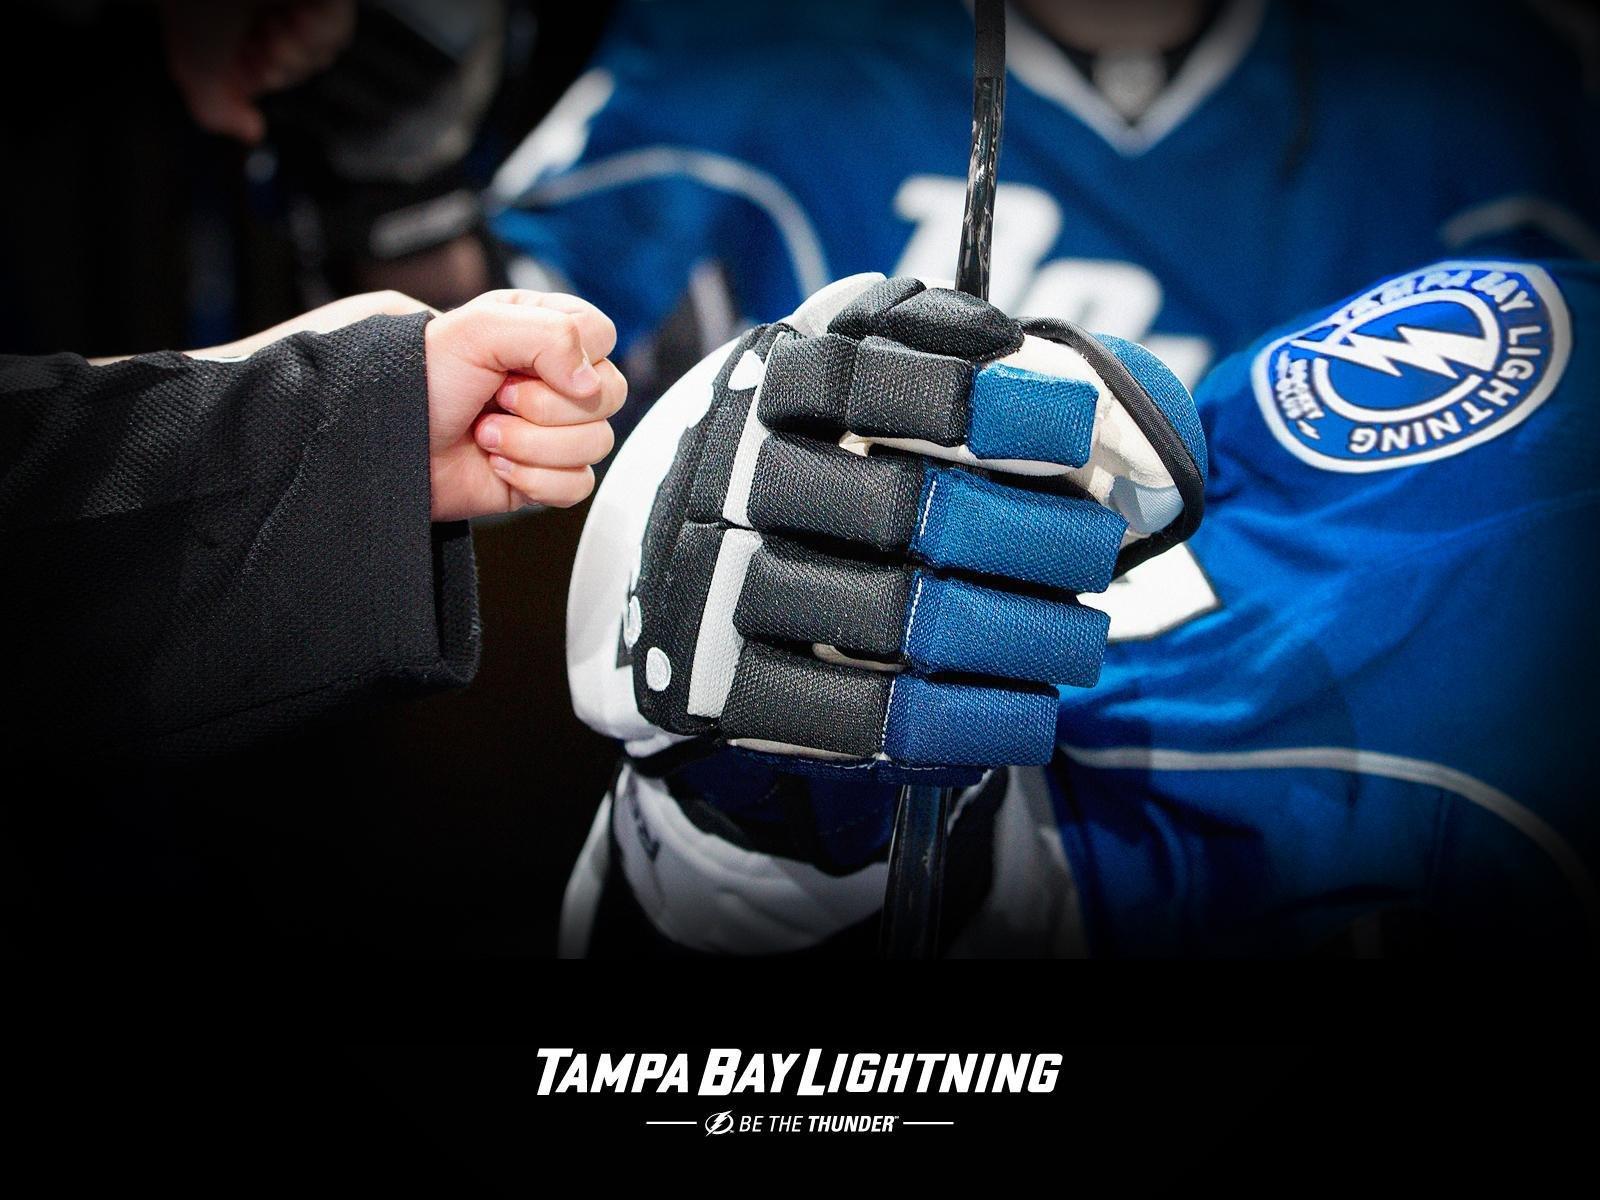 TAMPA BAY LIGHTNING nhl hockey 41 wallpaper 1600x1200 349230 1600x1200